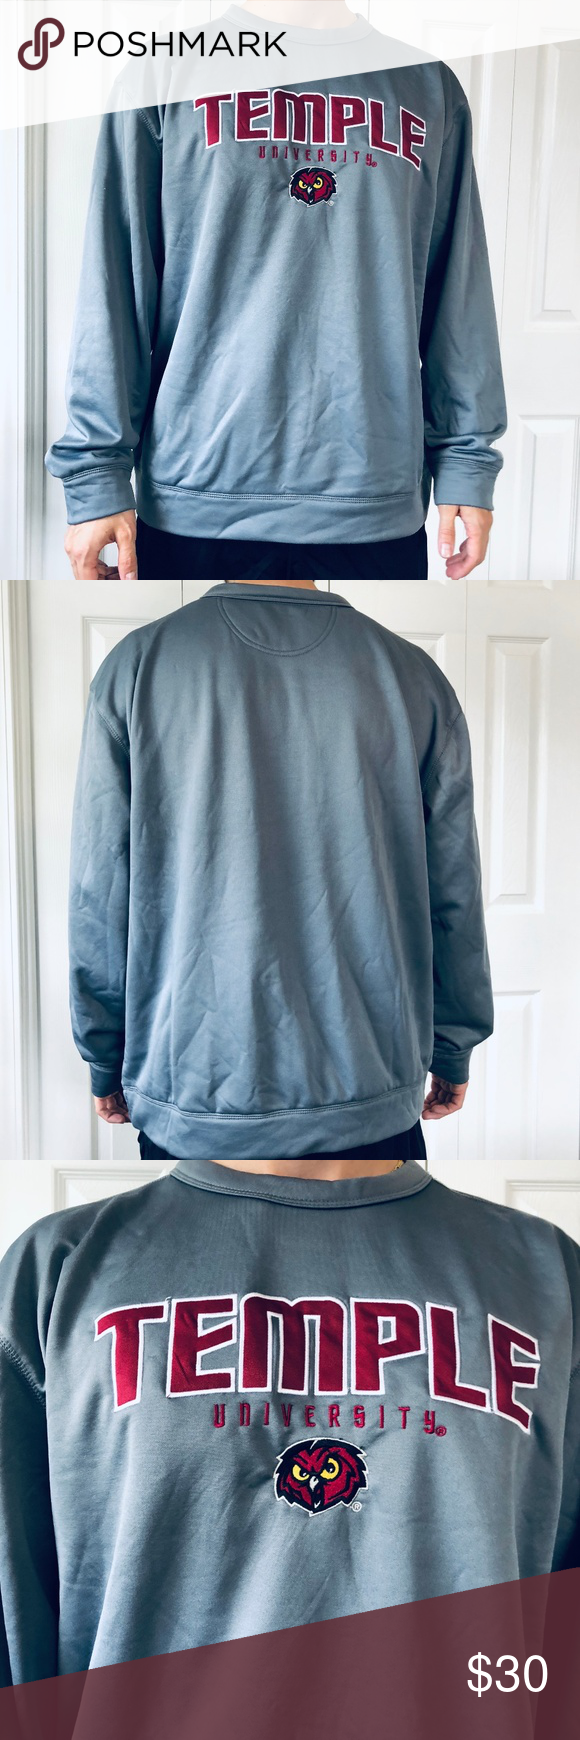 Champion Temple University Pullover Sweatshirt L Sweatshirt Shirt Champion Shirts Clothes Design [ 1740 x 580 Pixel ]